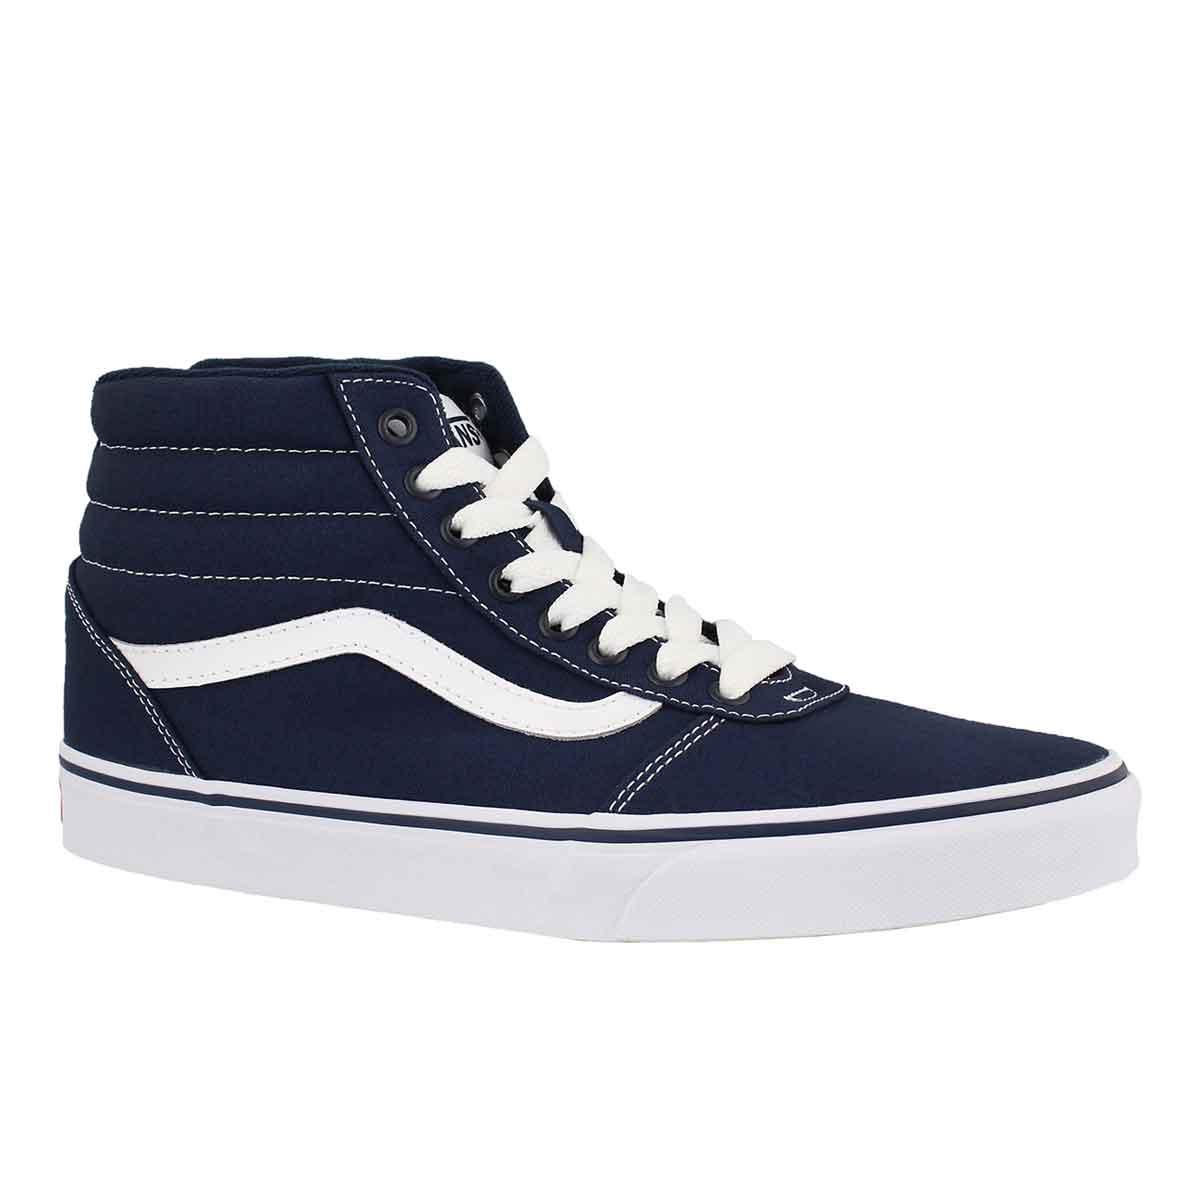 Men's WARD HI blue/white lace up sneakers